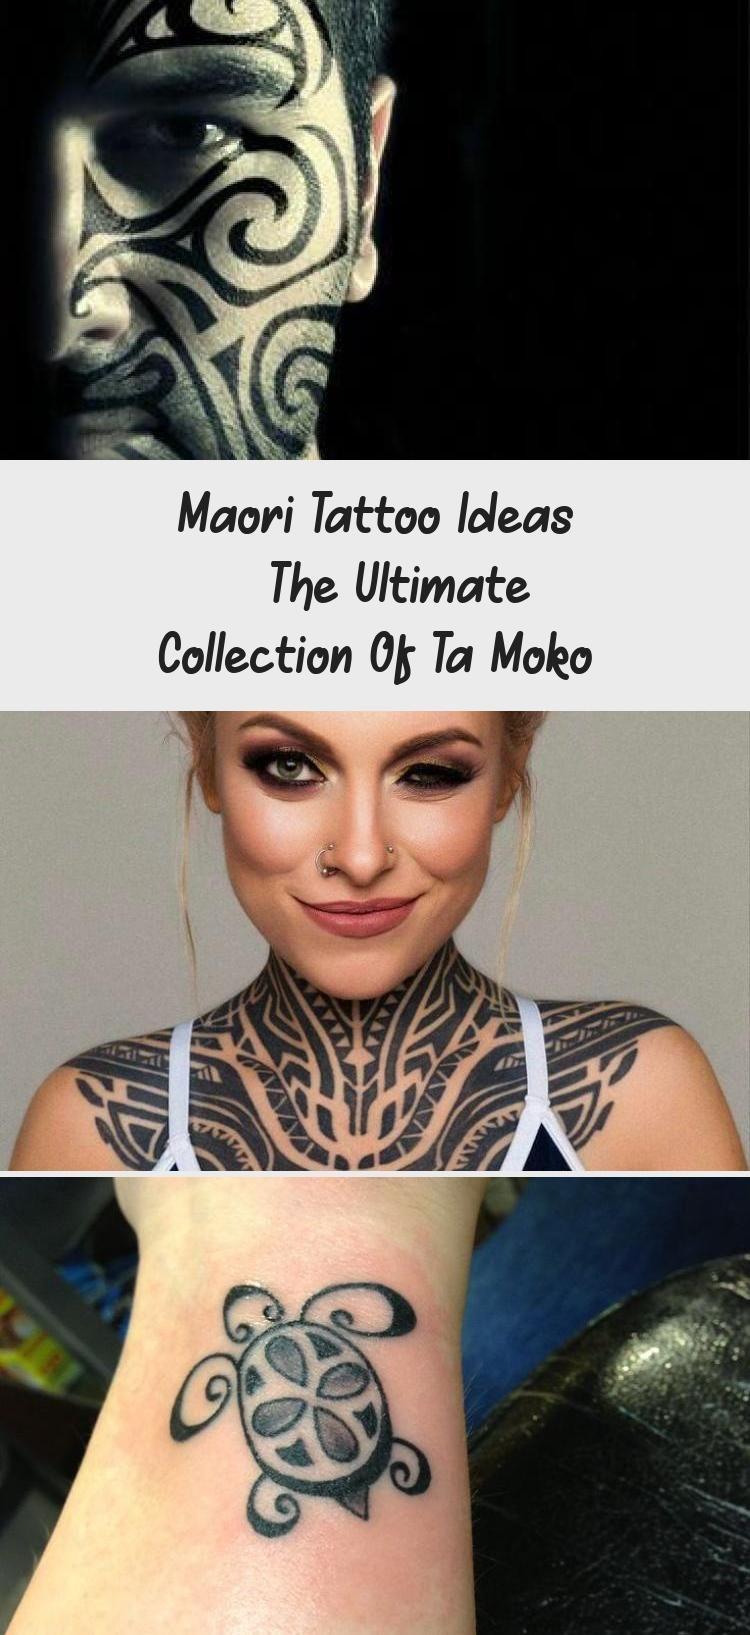 Photo of Maori Tattoo Ideas – The Ultimate Collection of Ta Moko #TattooIdeasSimple #Tatt…